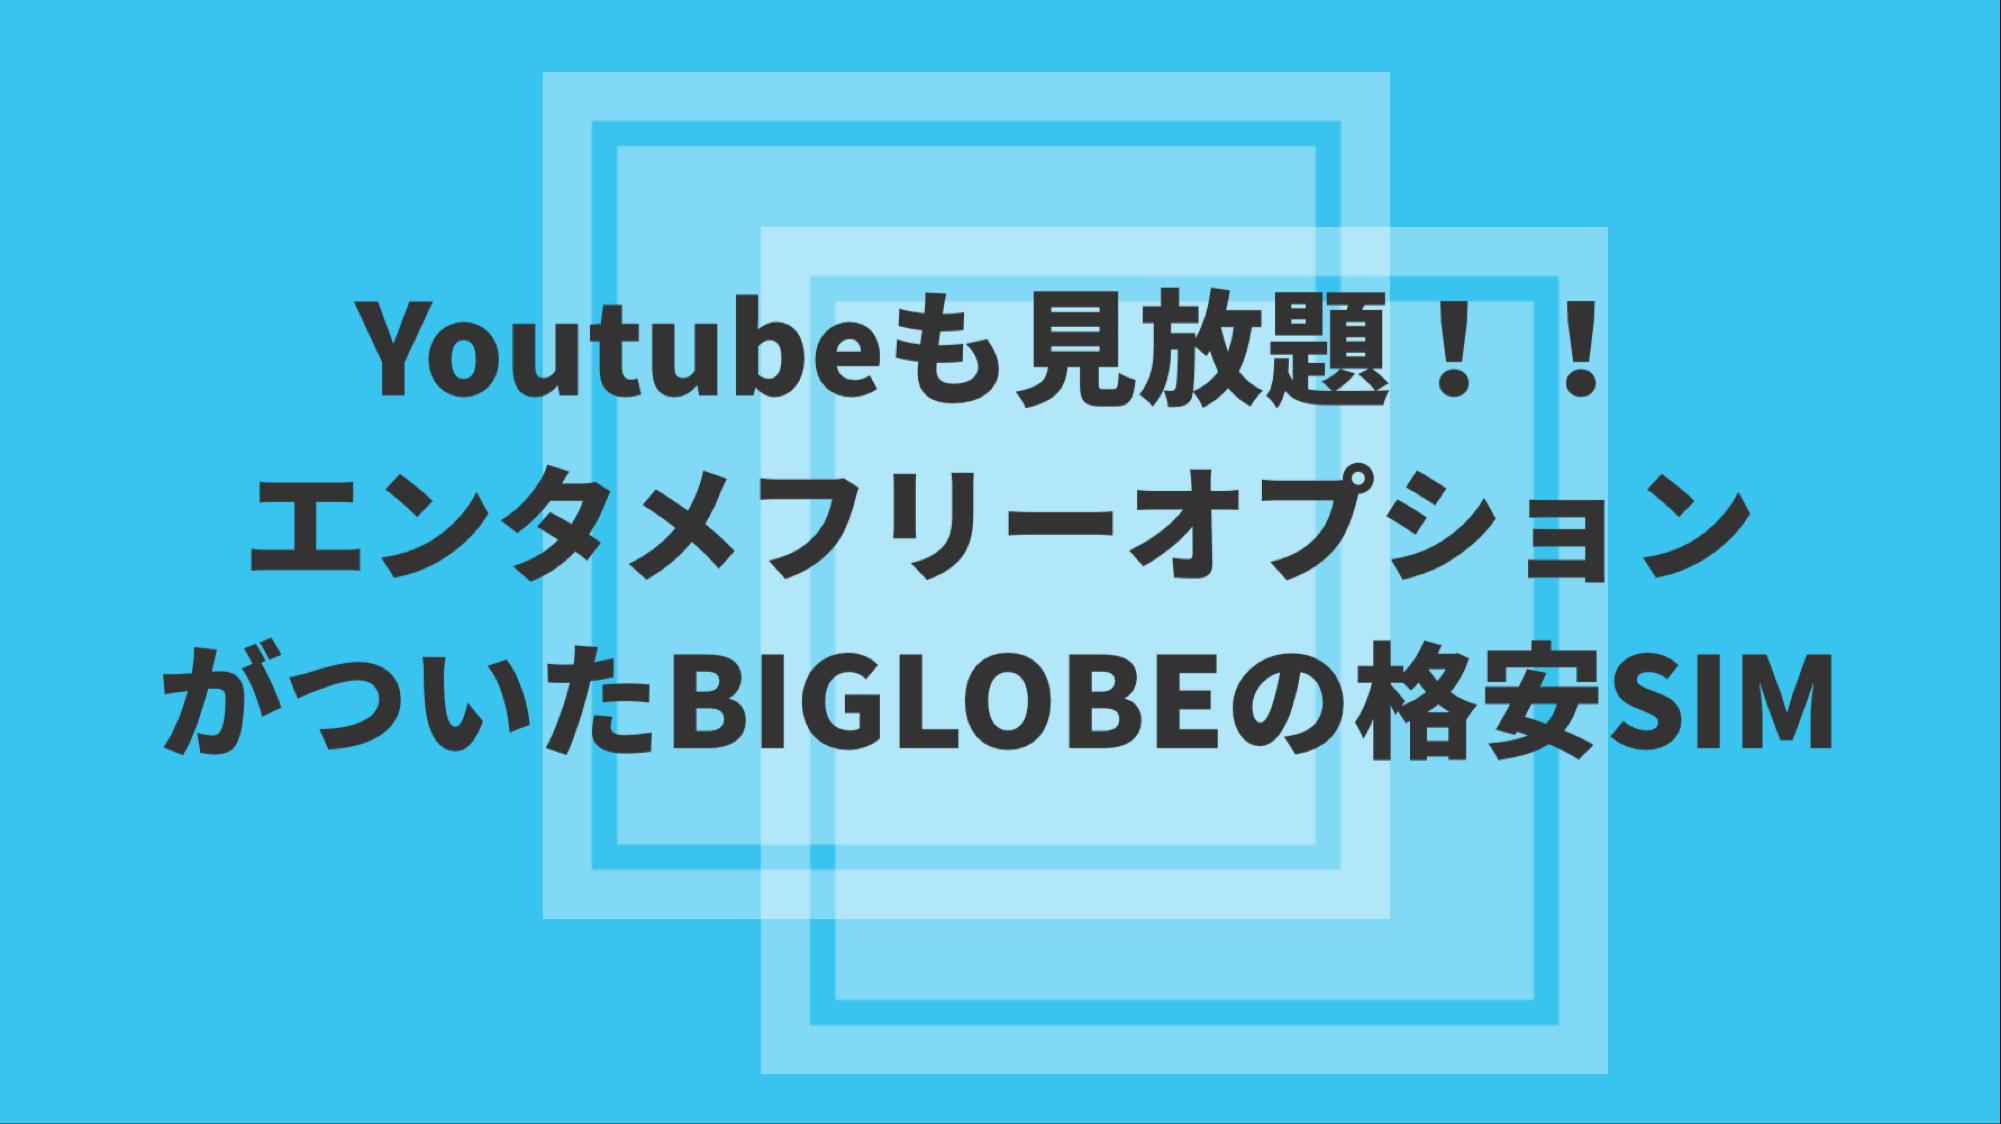 Youtubeも見放題エンタメフリーオプションがついたBIGLOBEの格安SIM